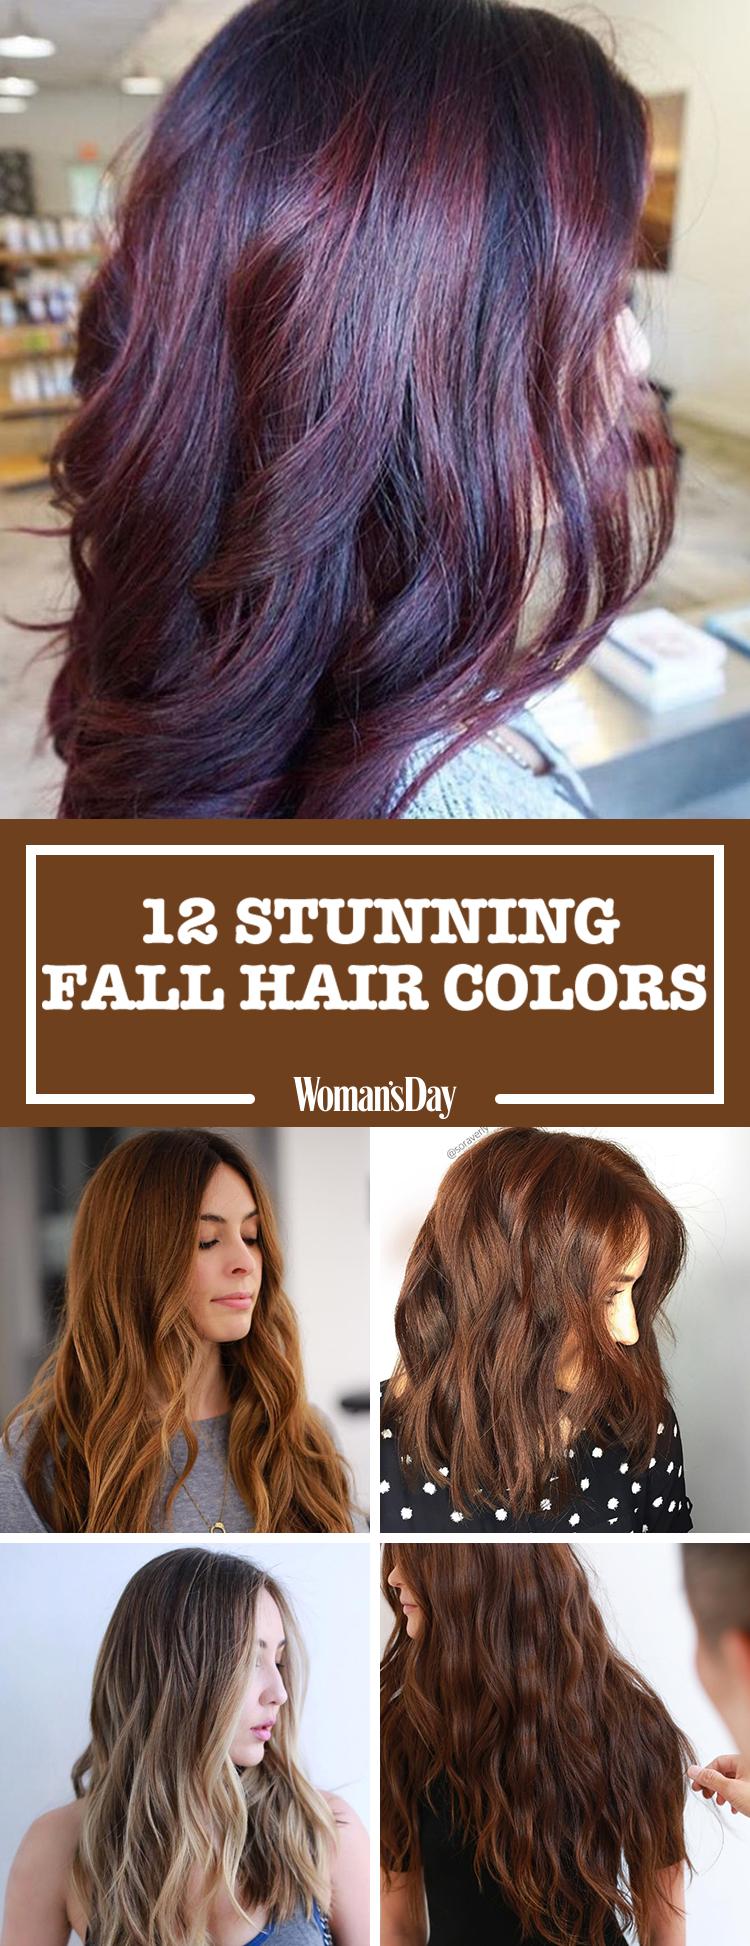 Autumn Hair Color Ideas For Black Women